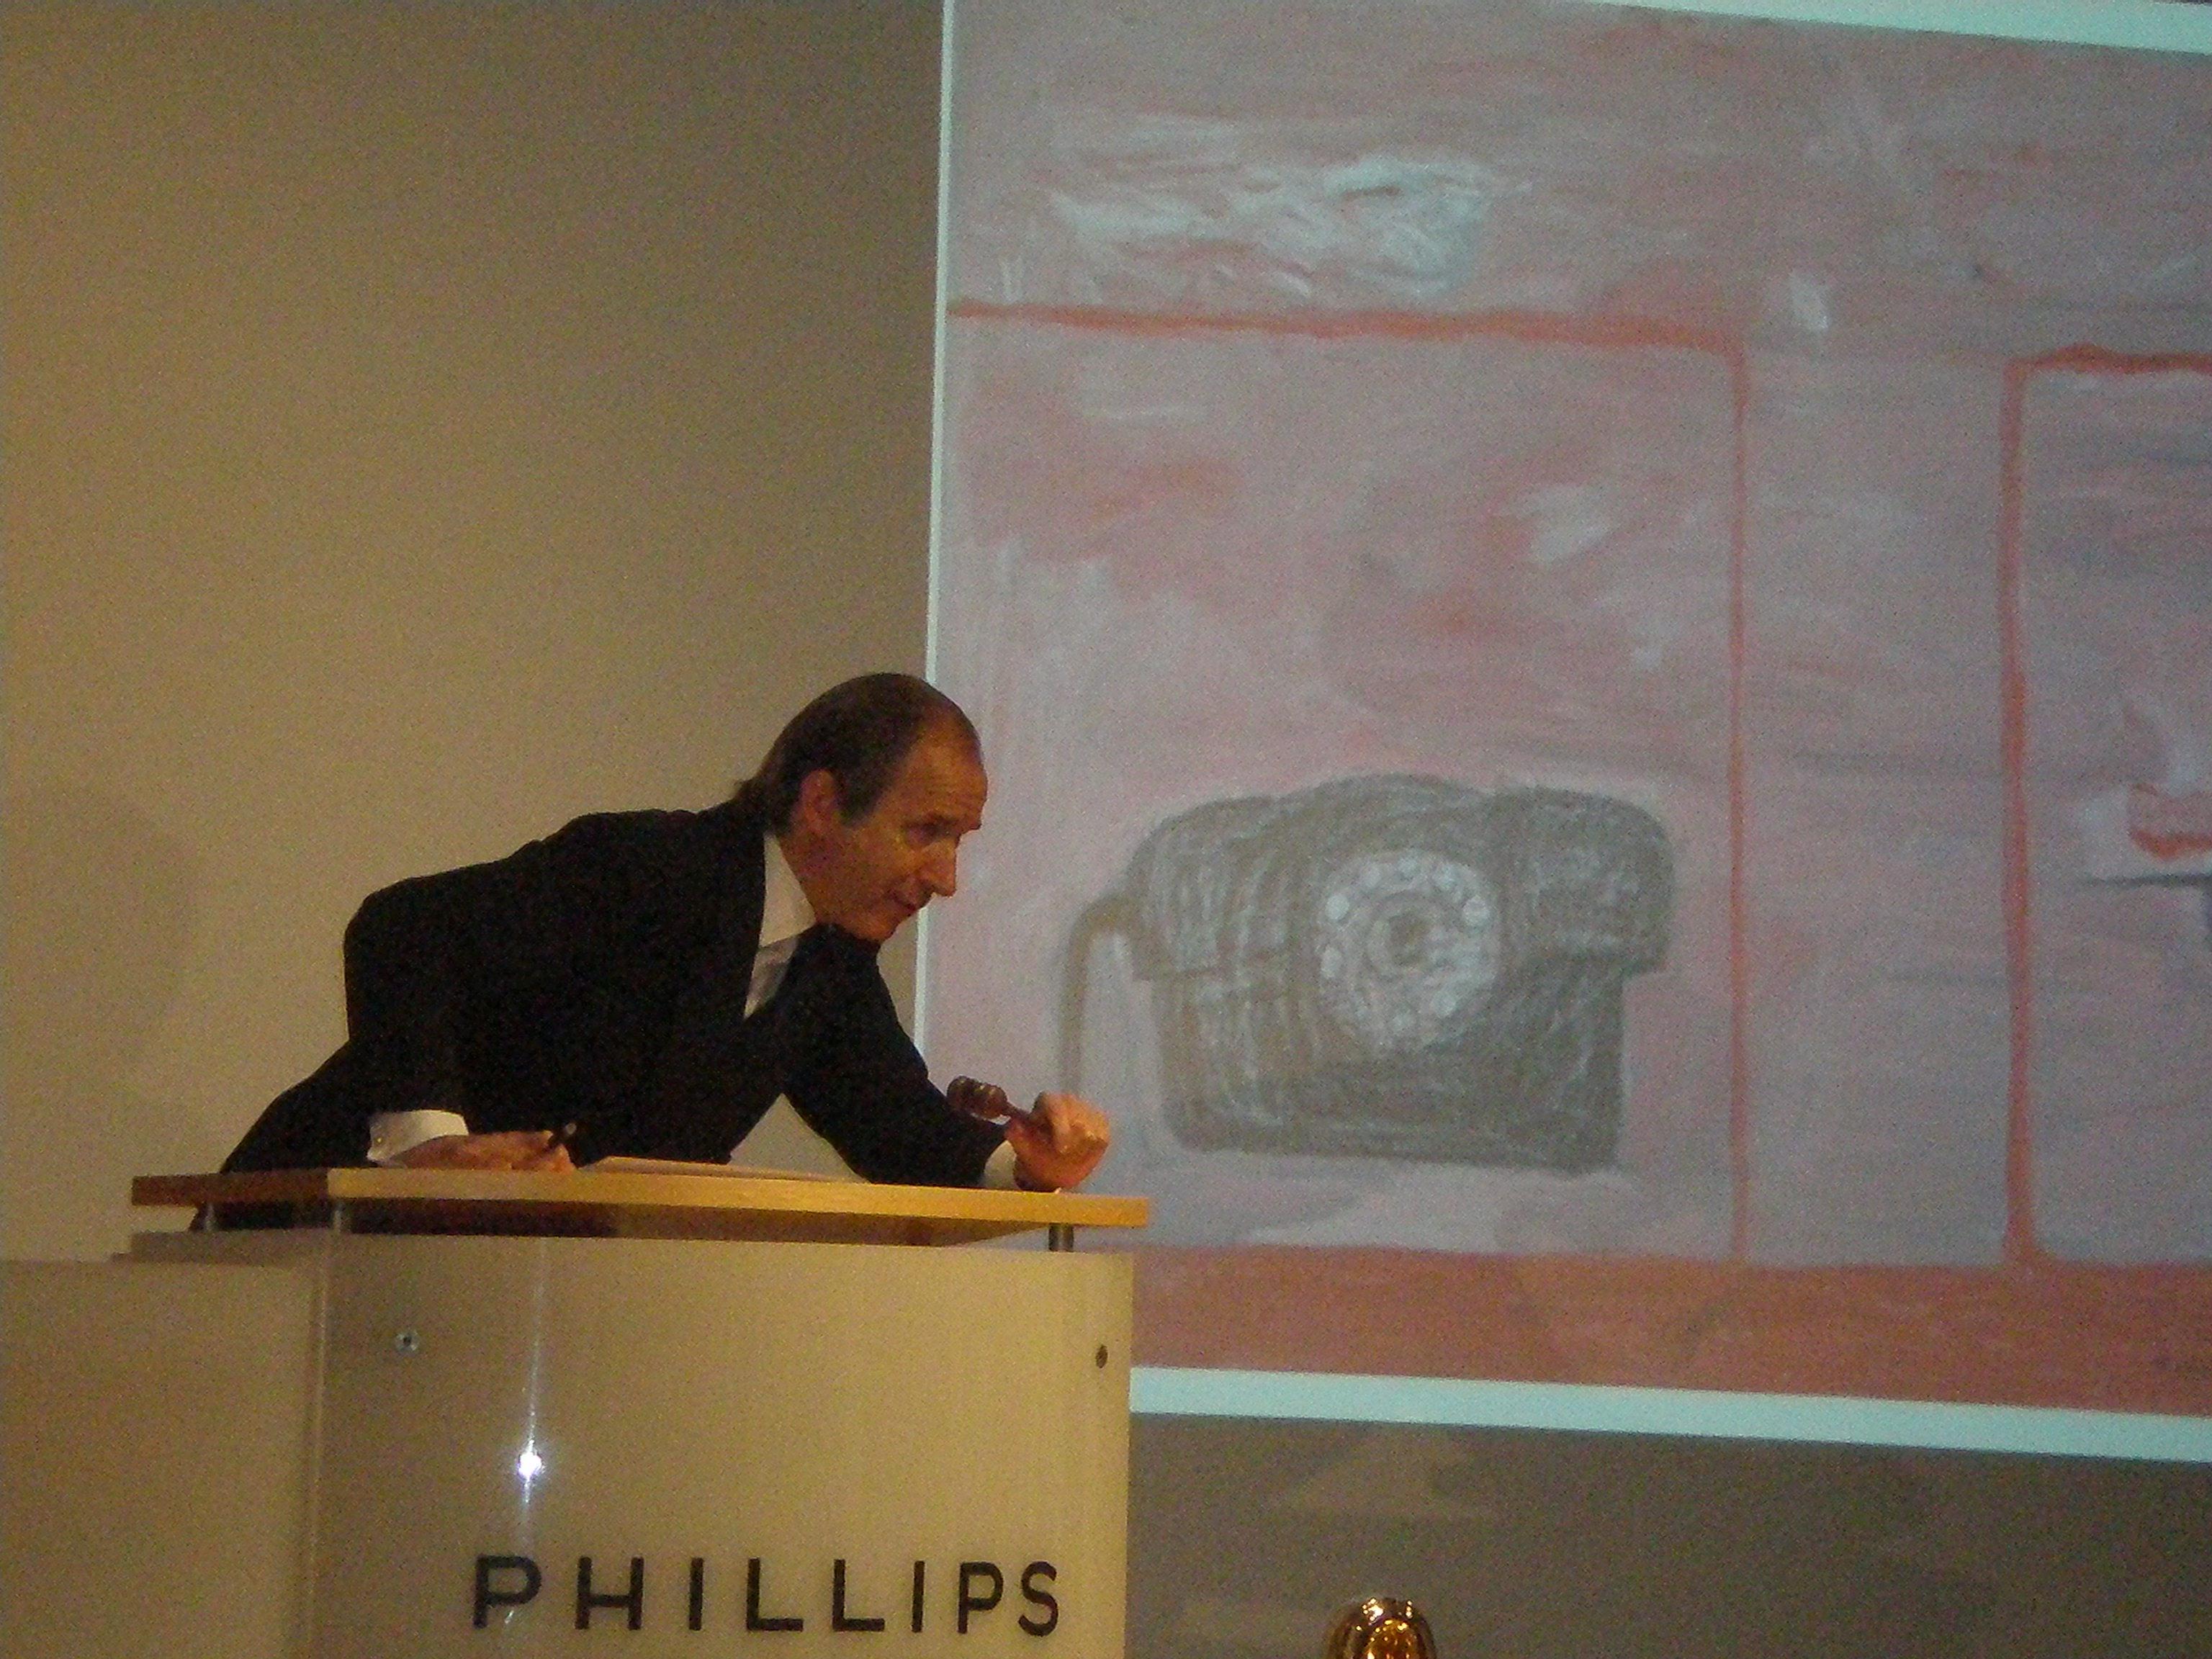 simon-de-pury-phillips-de-pury-contemporary-art-sale-may-2009-6